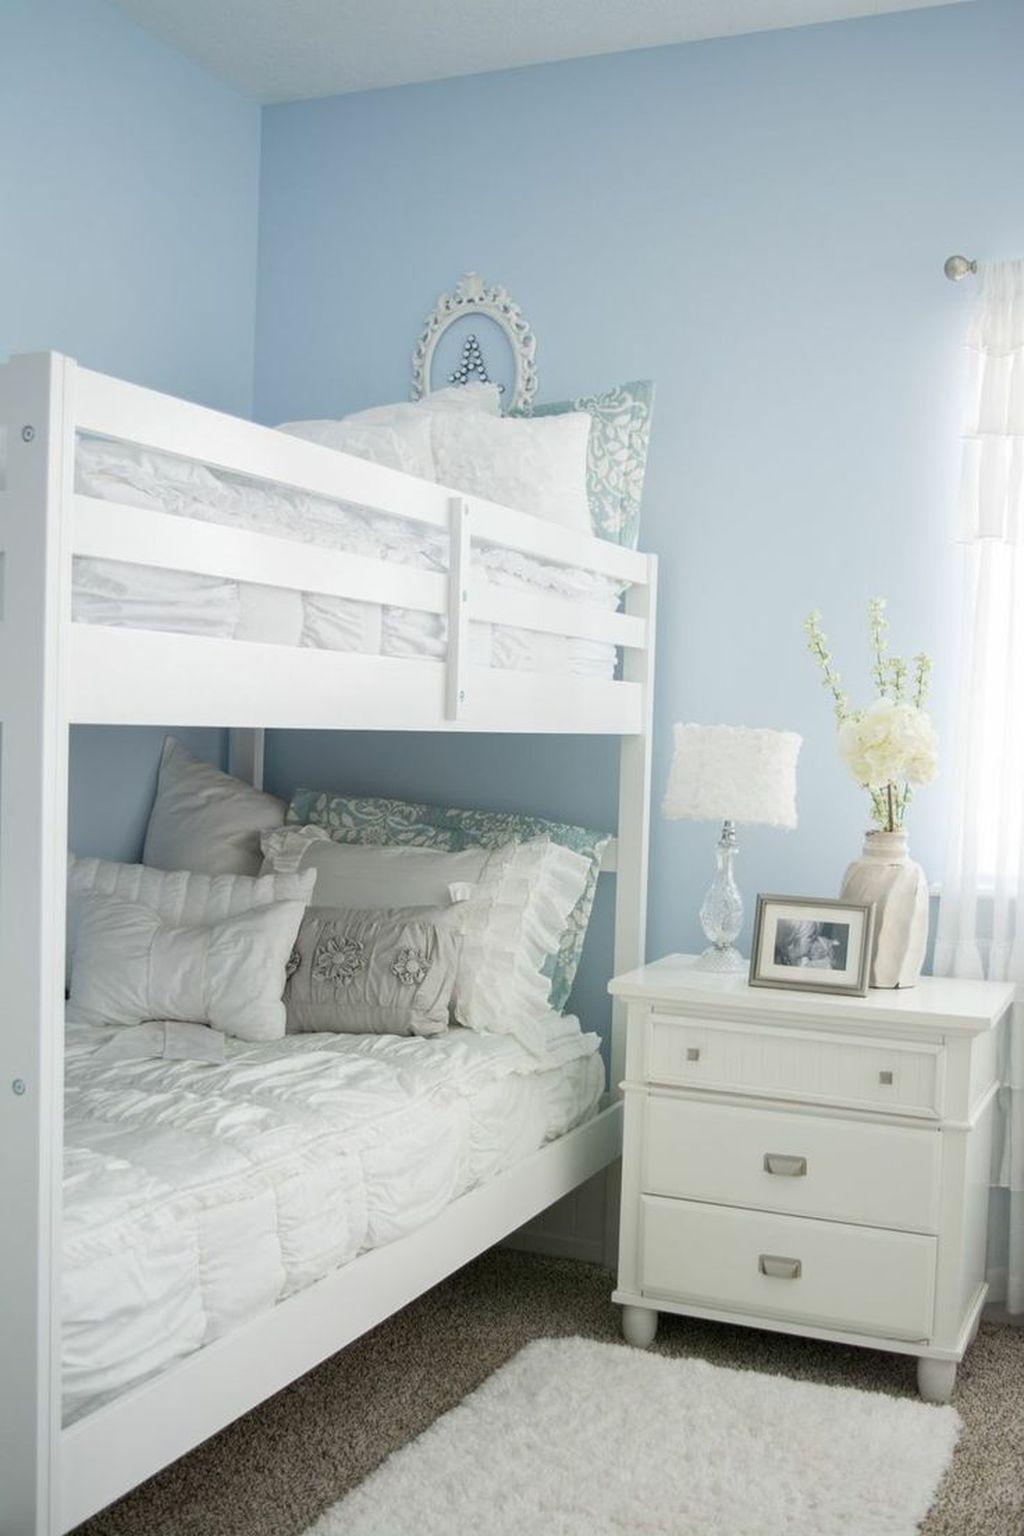 39 Wonderful Girls Room Design Ideas33